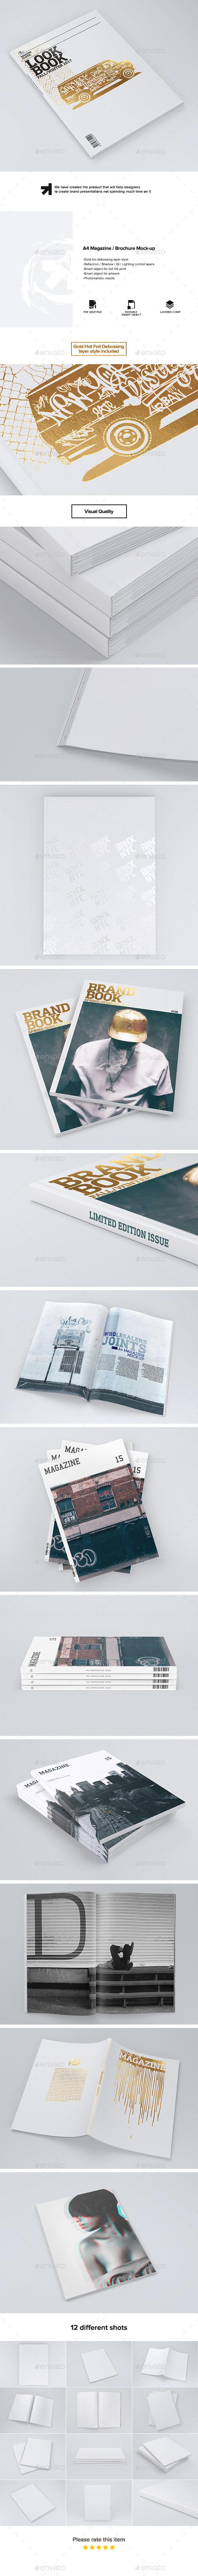 A4 Magazine / Brochure Mock-up - Magazines Print